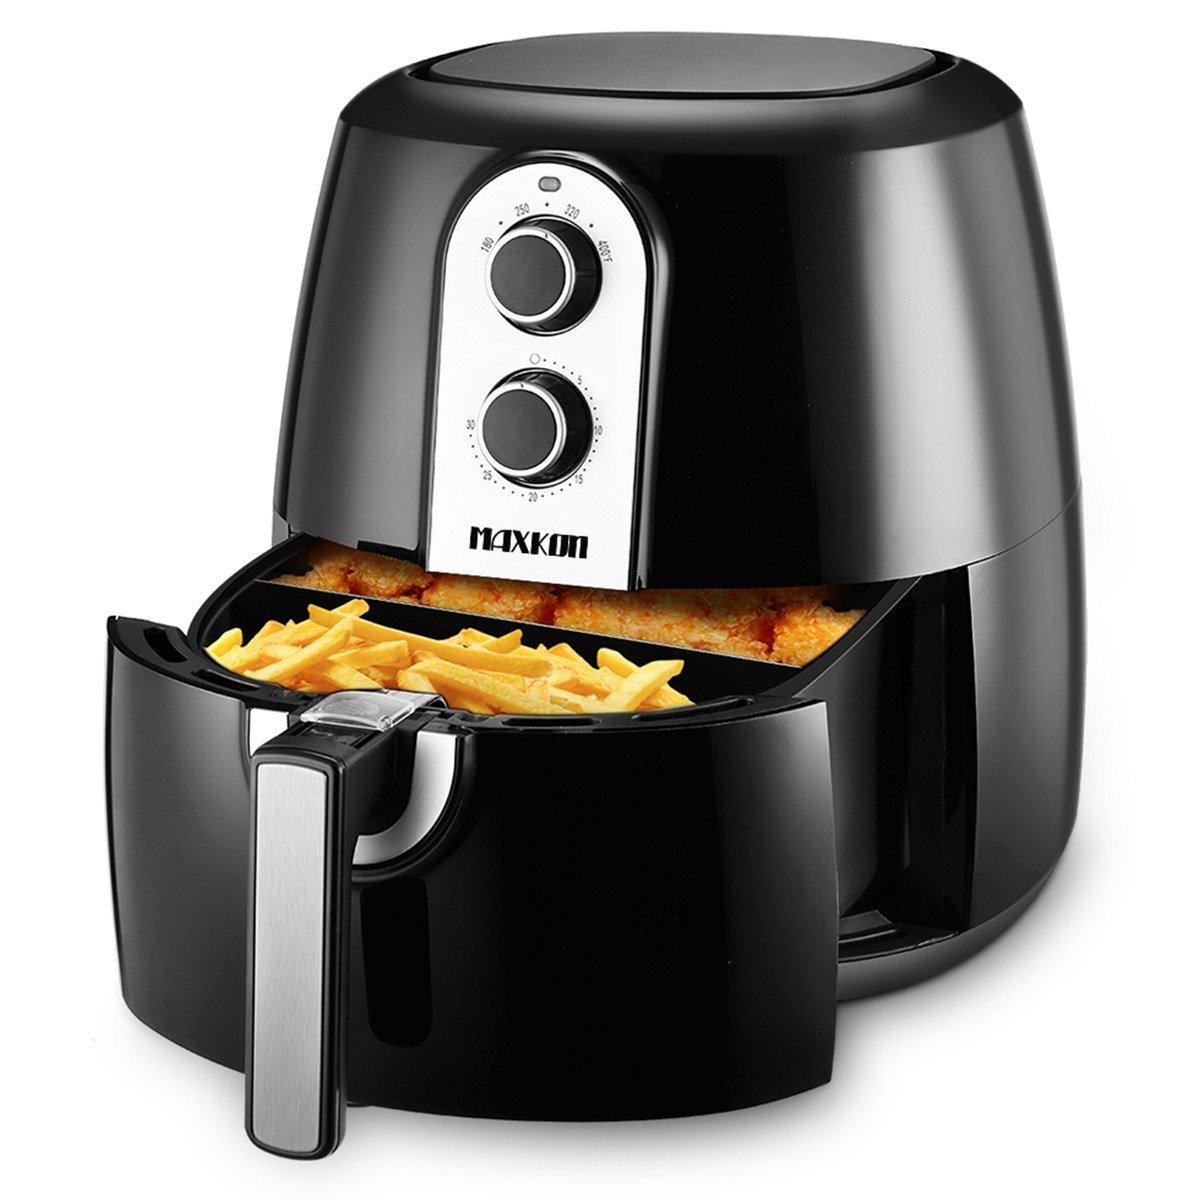 Maxkon 5.8 Qt Air Fryer 8-in-1 XL with 6-piece Accessory Set Recipes Cooker, 80% Oil Less 1800 Watt Electric Deep Fryers